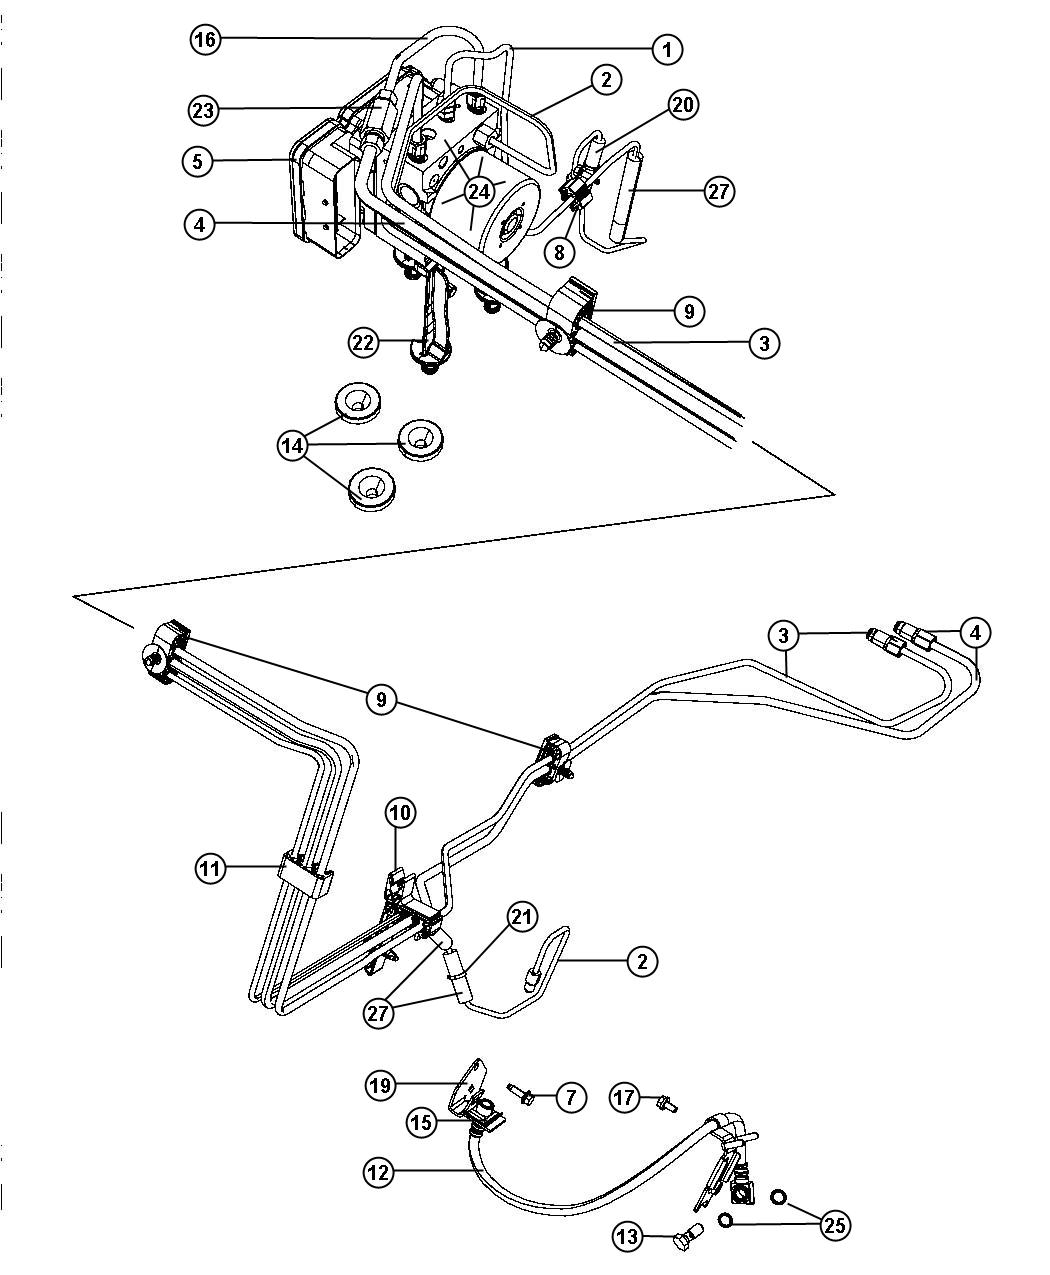 Dodge Charger Tube Brake Br4 Br4 Xzz Brd Br3 Disc Wheel Lock